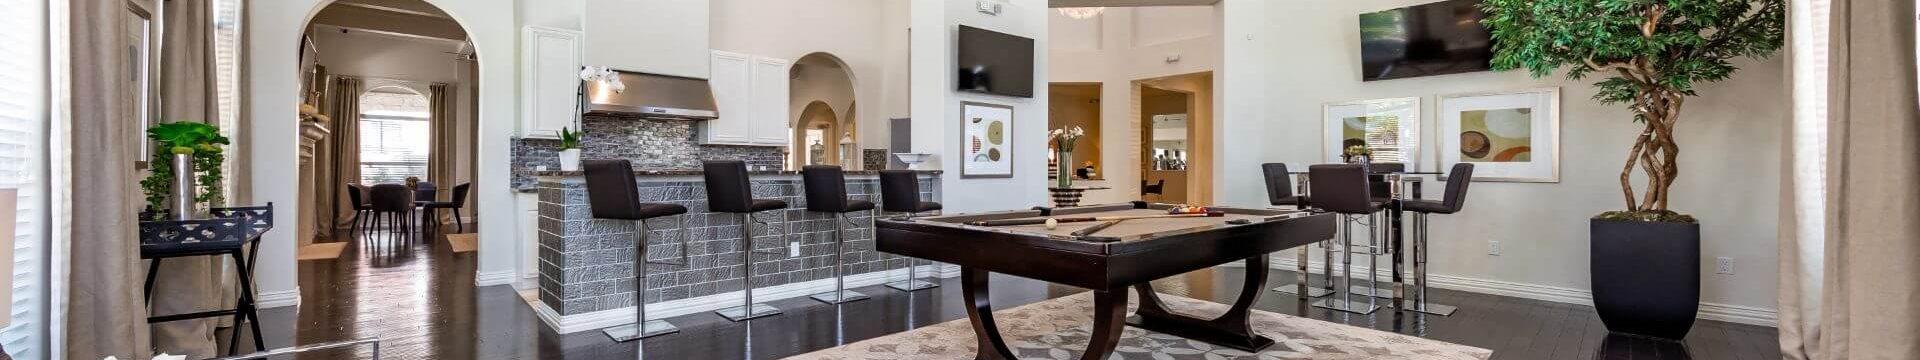 Fun Billiards Room at Mansions Lakeway, Lakeway, TX, 78738